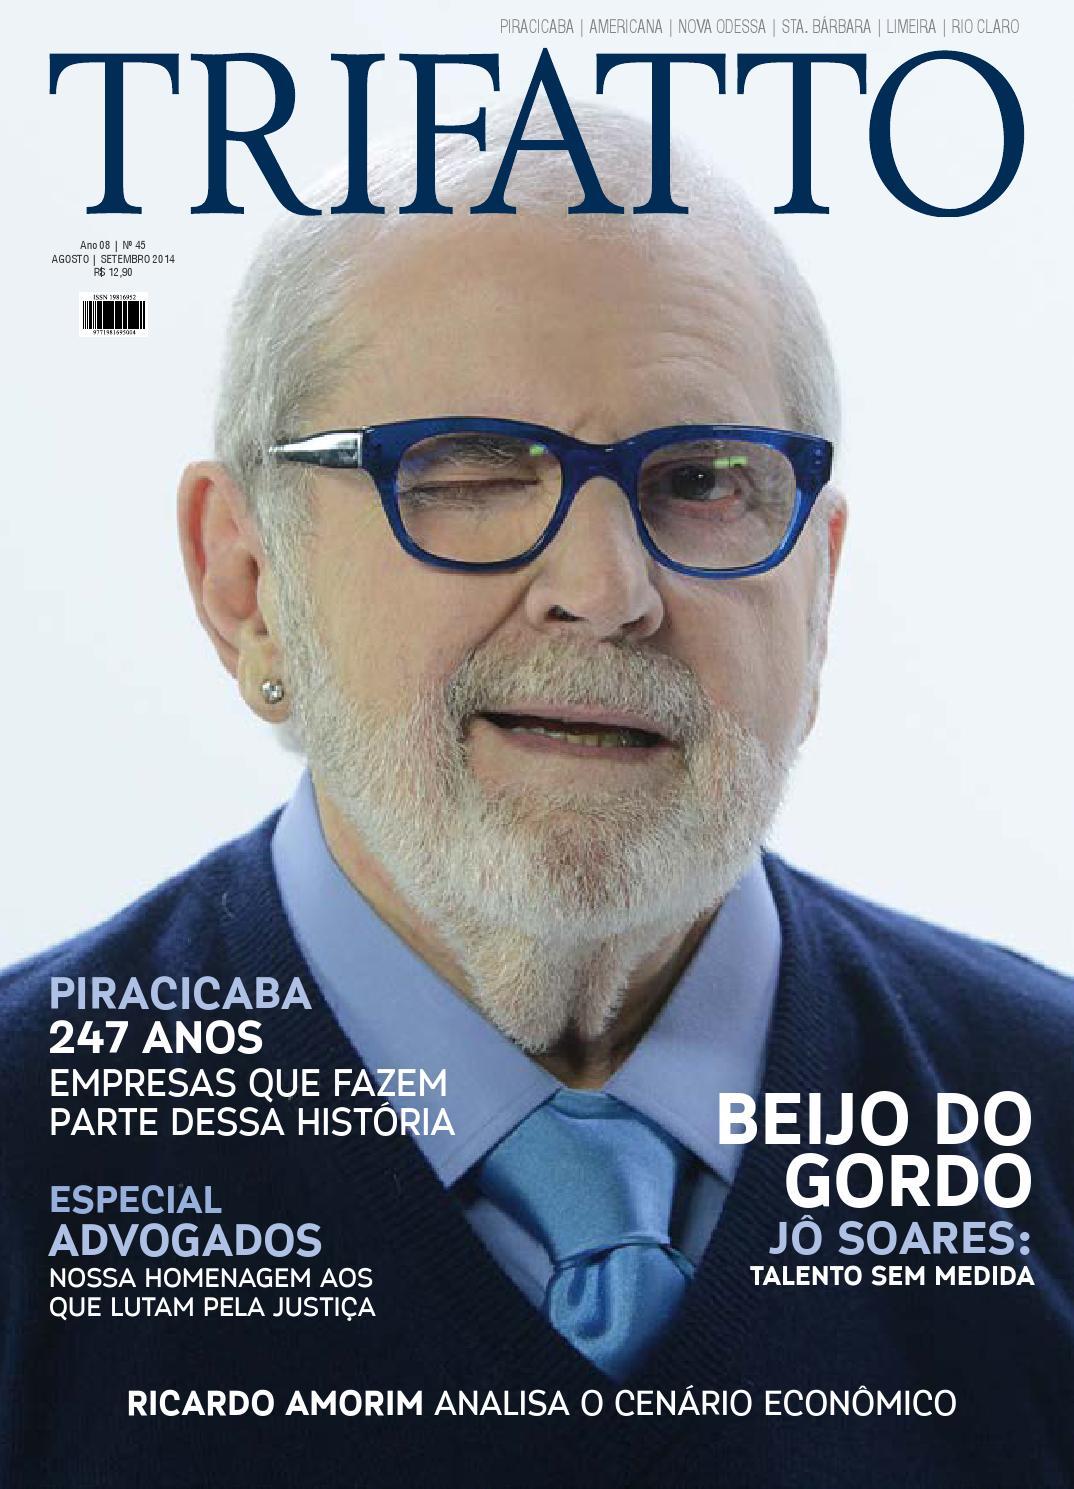 4a6a4fe4857 Trifatto 45 by Trifatto Editora - issuu